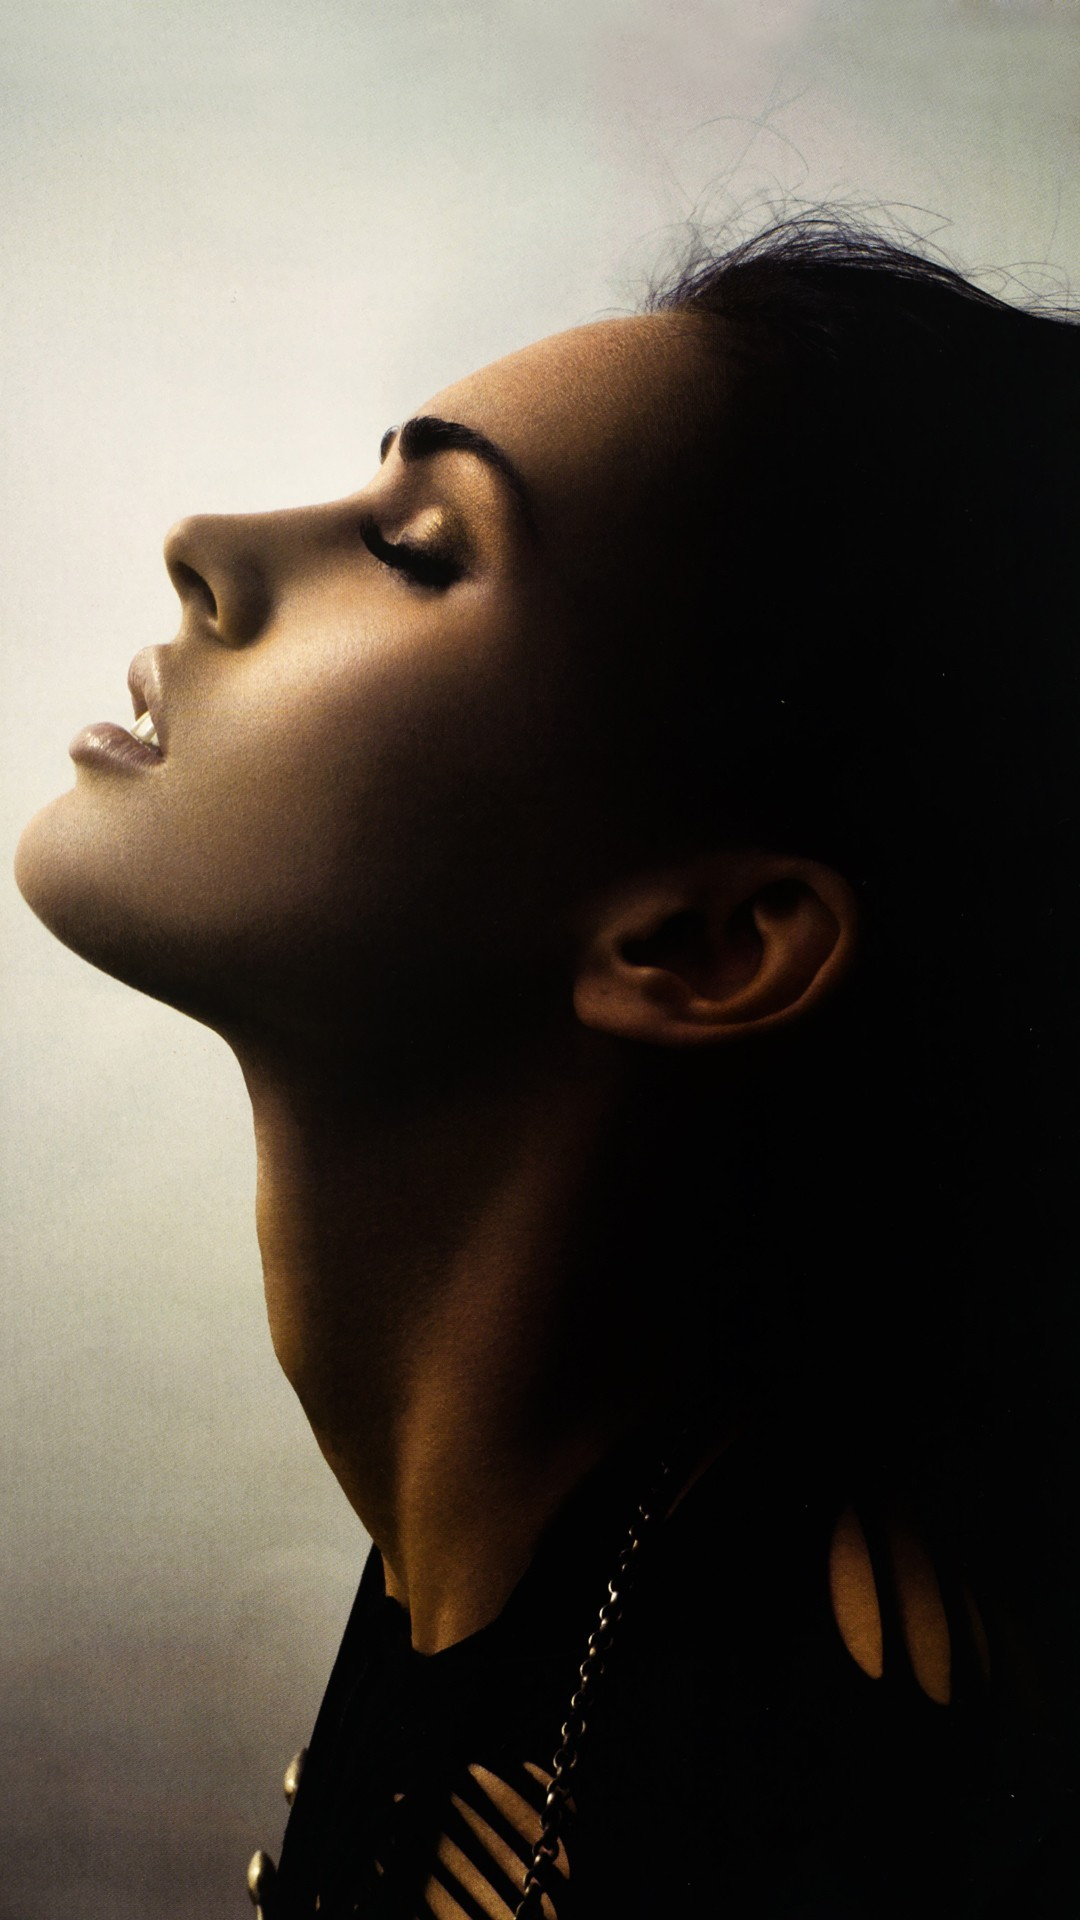 Megan Fox htc one wallpaper